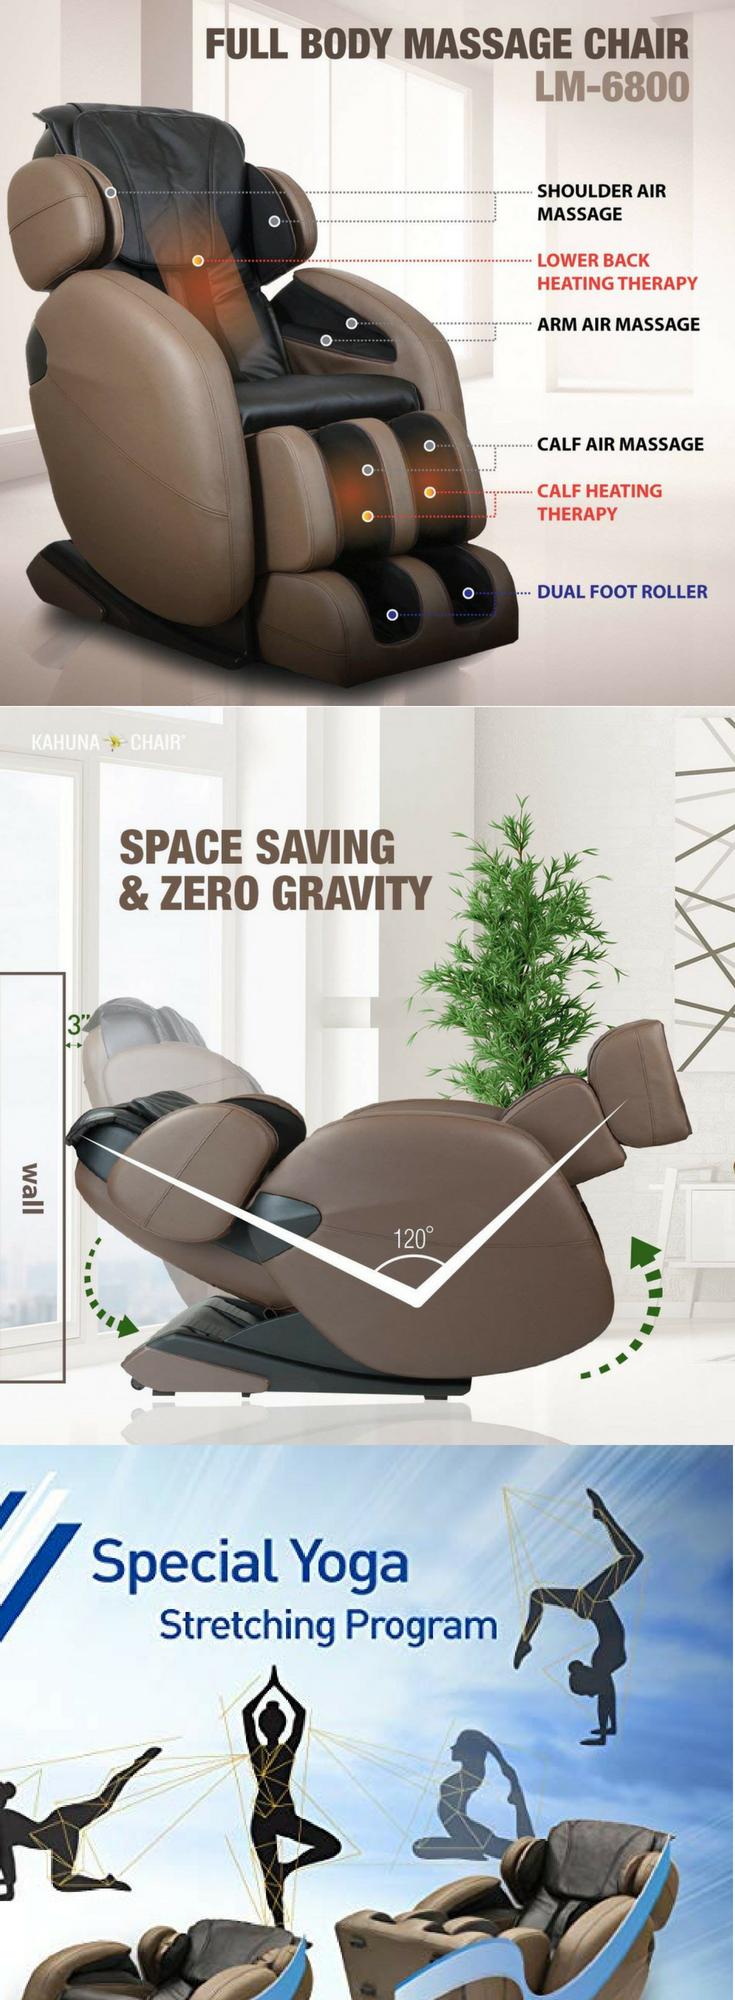 Massage Chair Space Saving Zero Gravity Full Body Recliner Lm6800